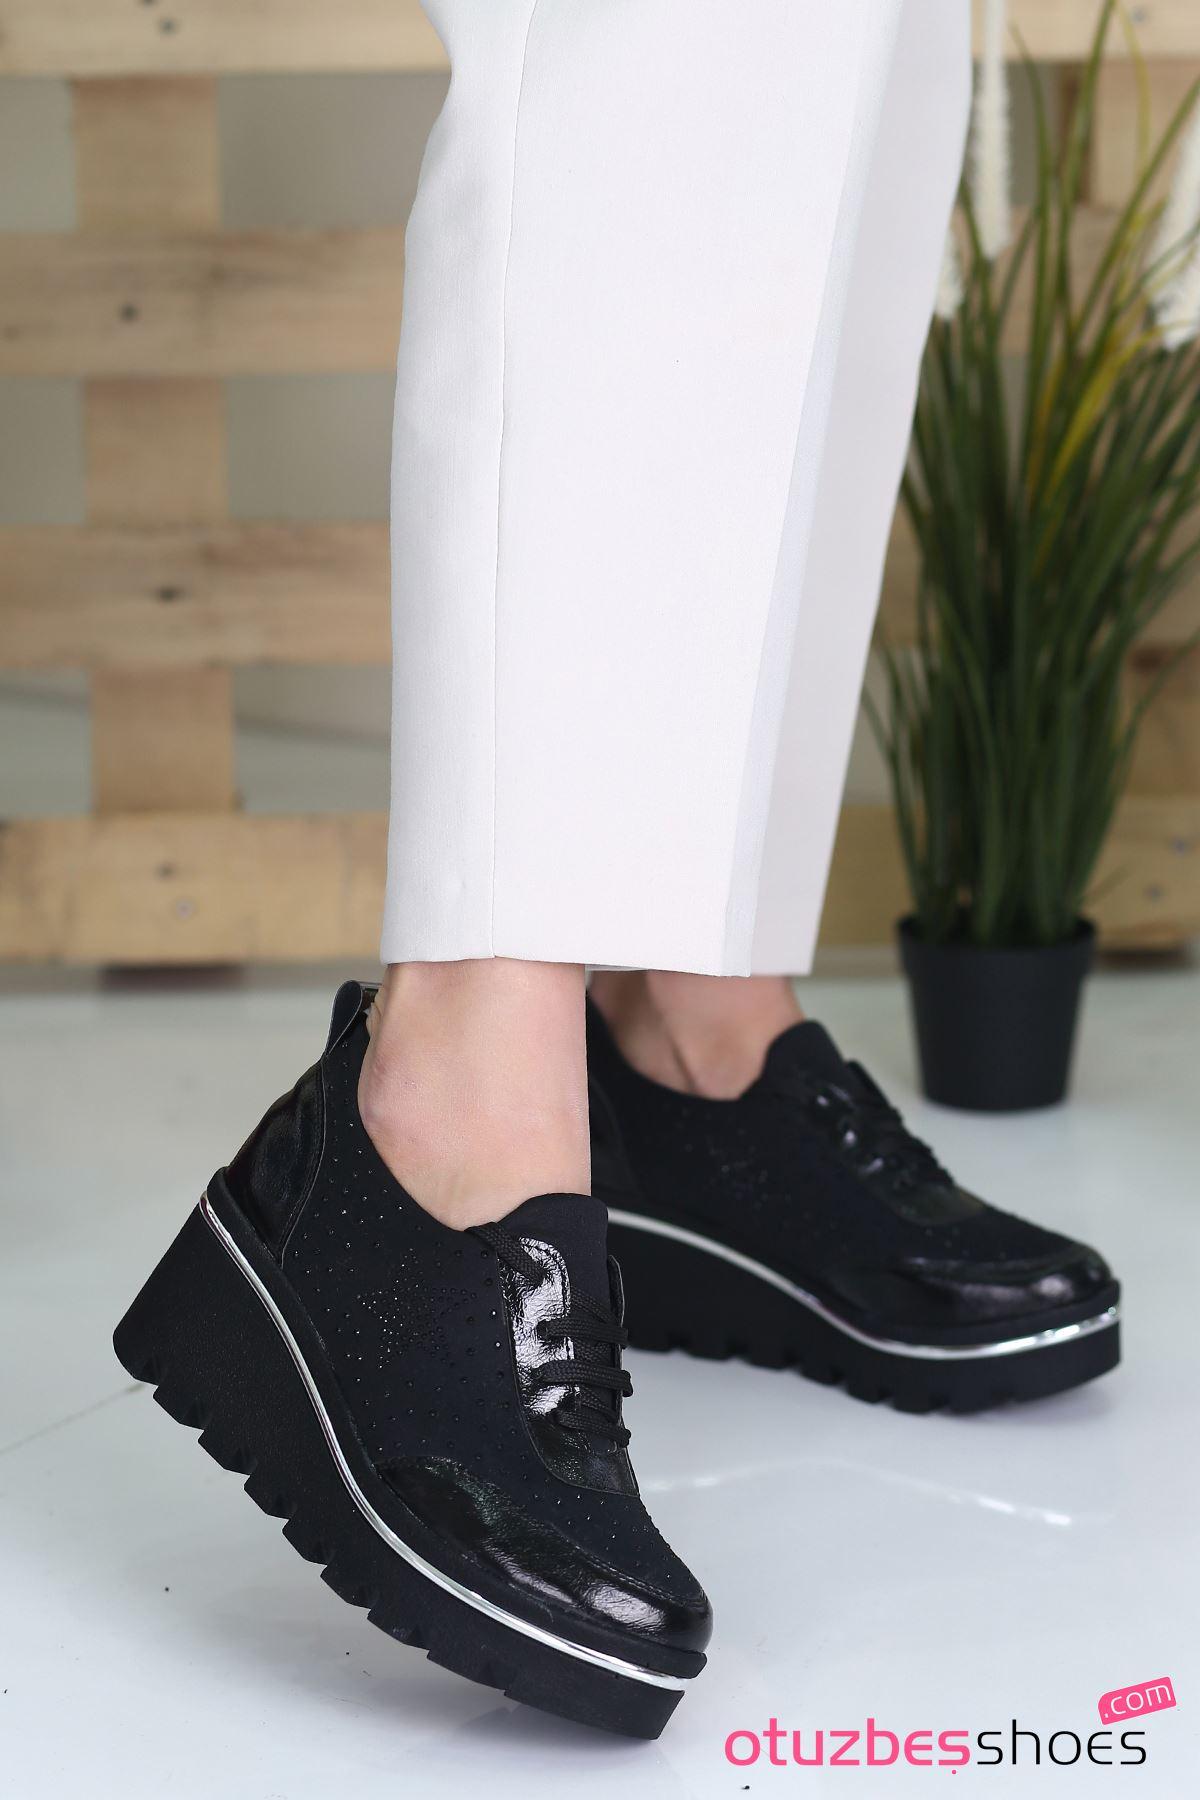 Wassa Dalgıç Kumaş Taş Detay Dolgu Topuk Ayakkabı Siyah